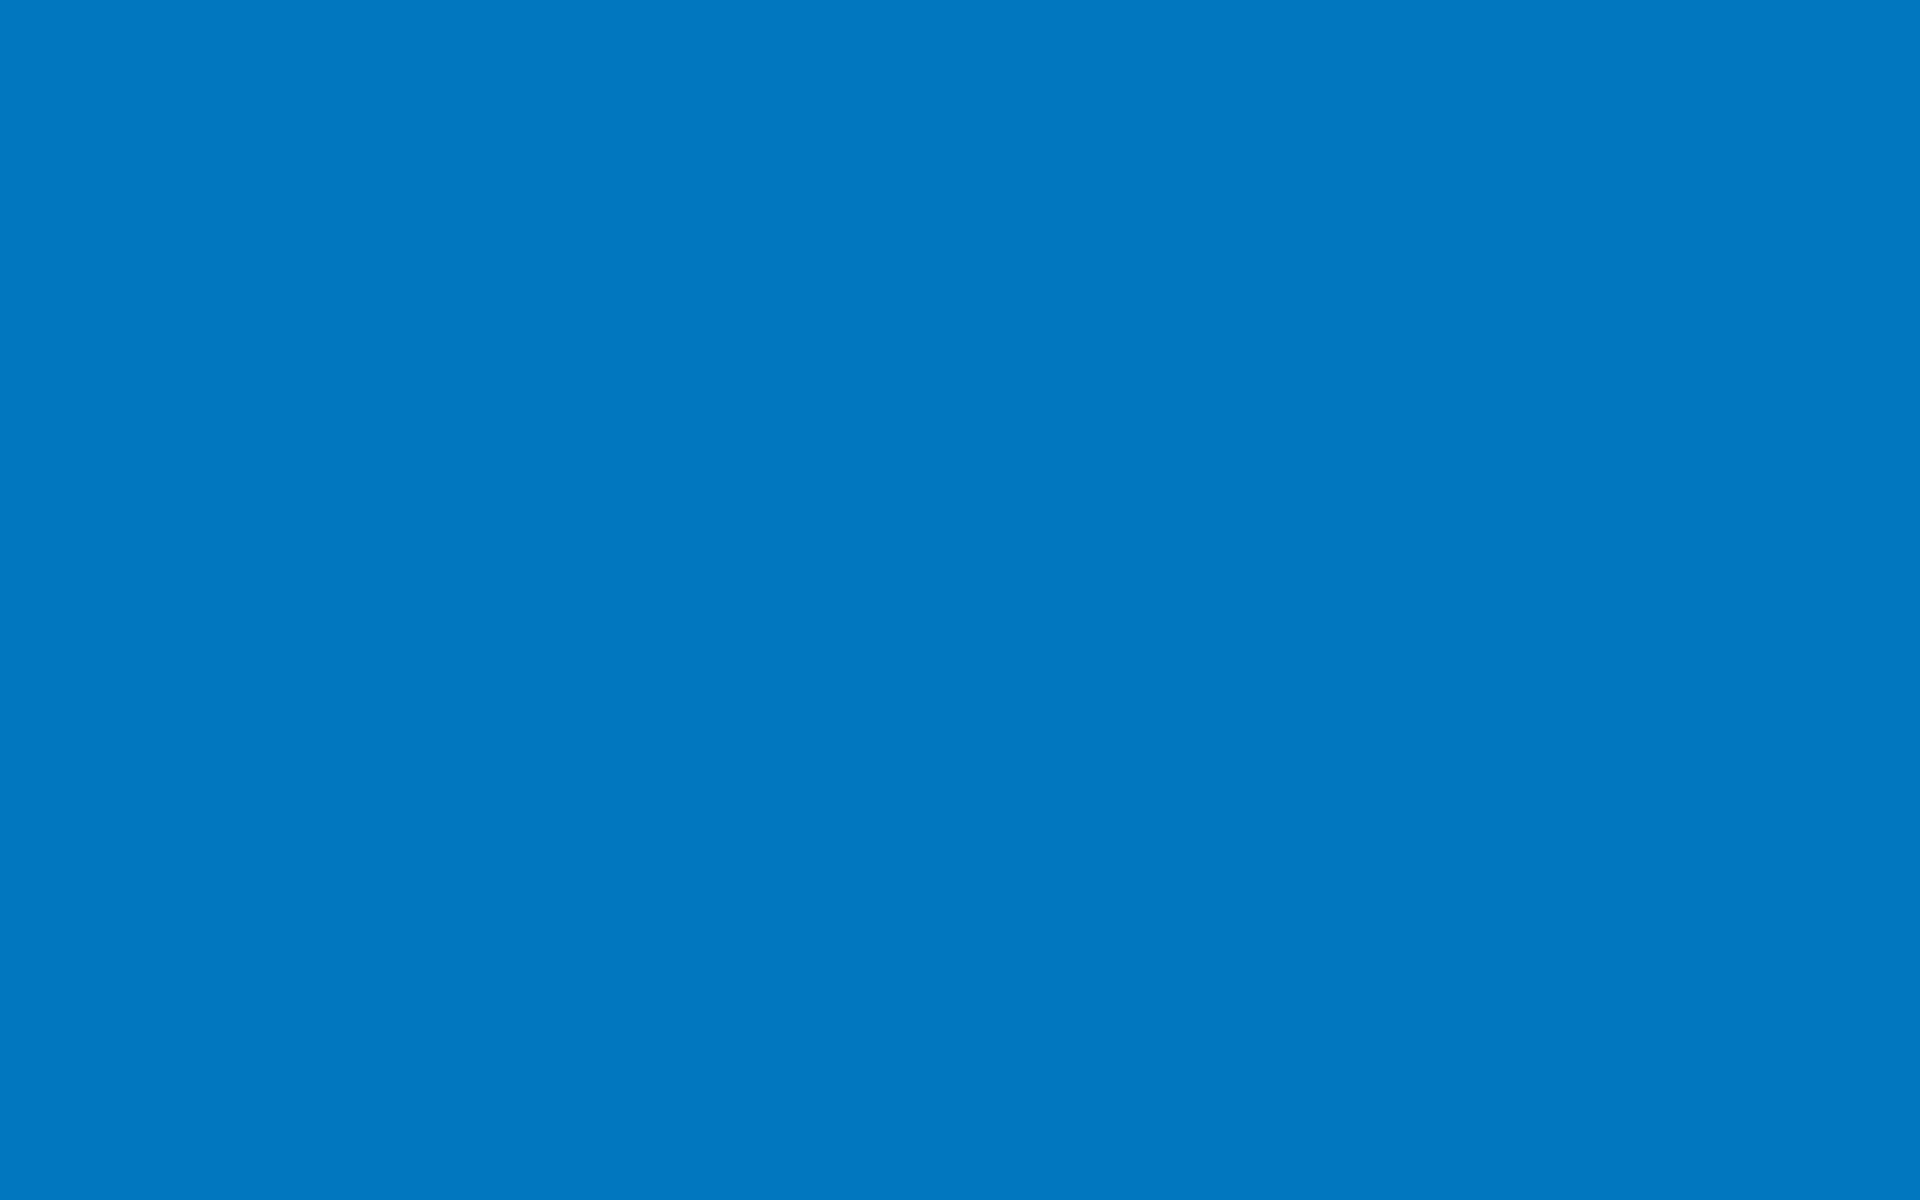 1920x1200 Ocean Boat Blue Solid Color Background